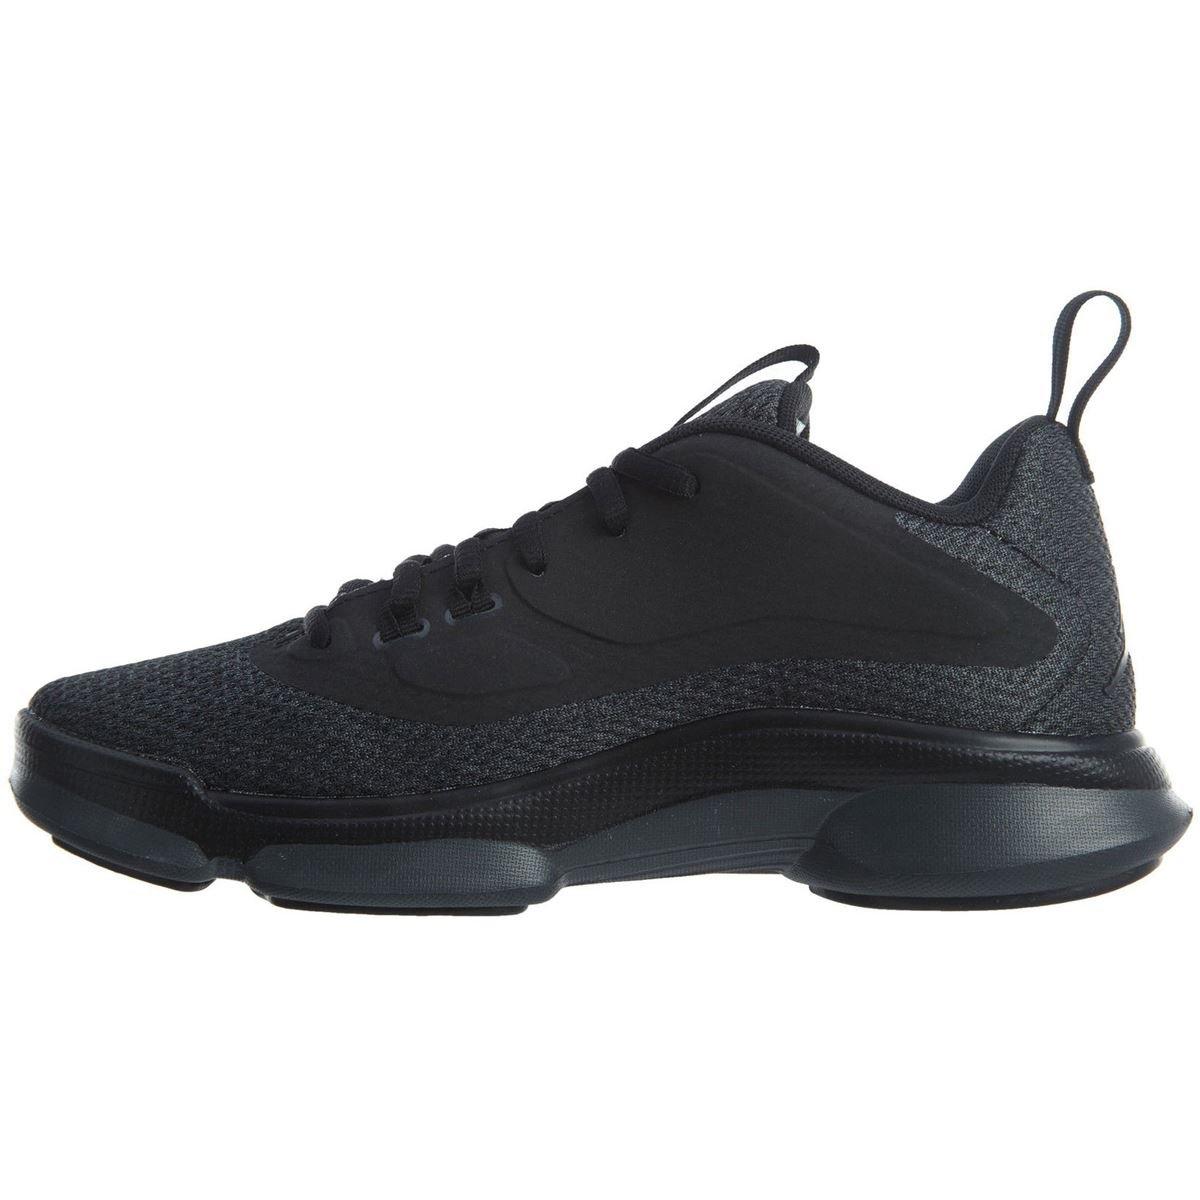 Nike Youth Jordan Impact Training Black Anthracite Mesh Trainers 38.5 EU